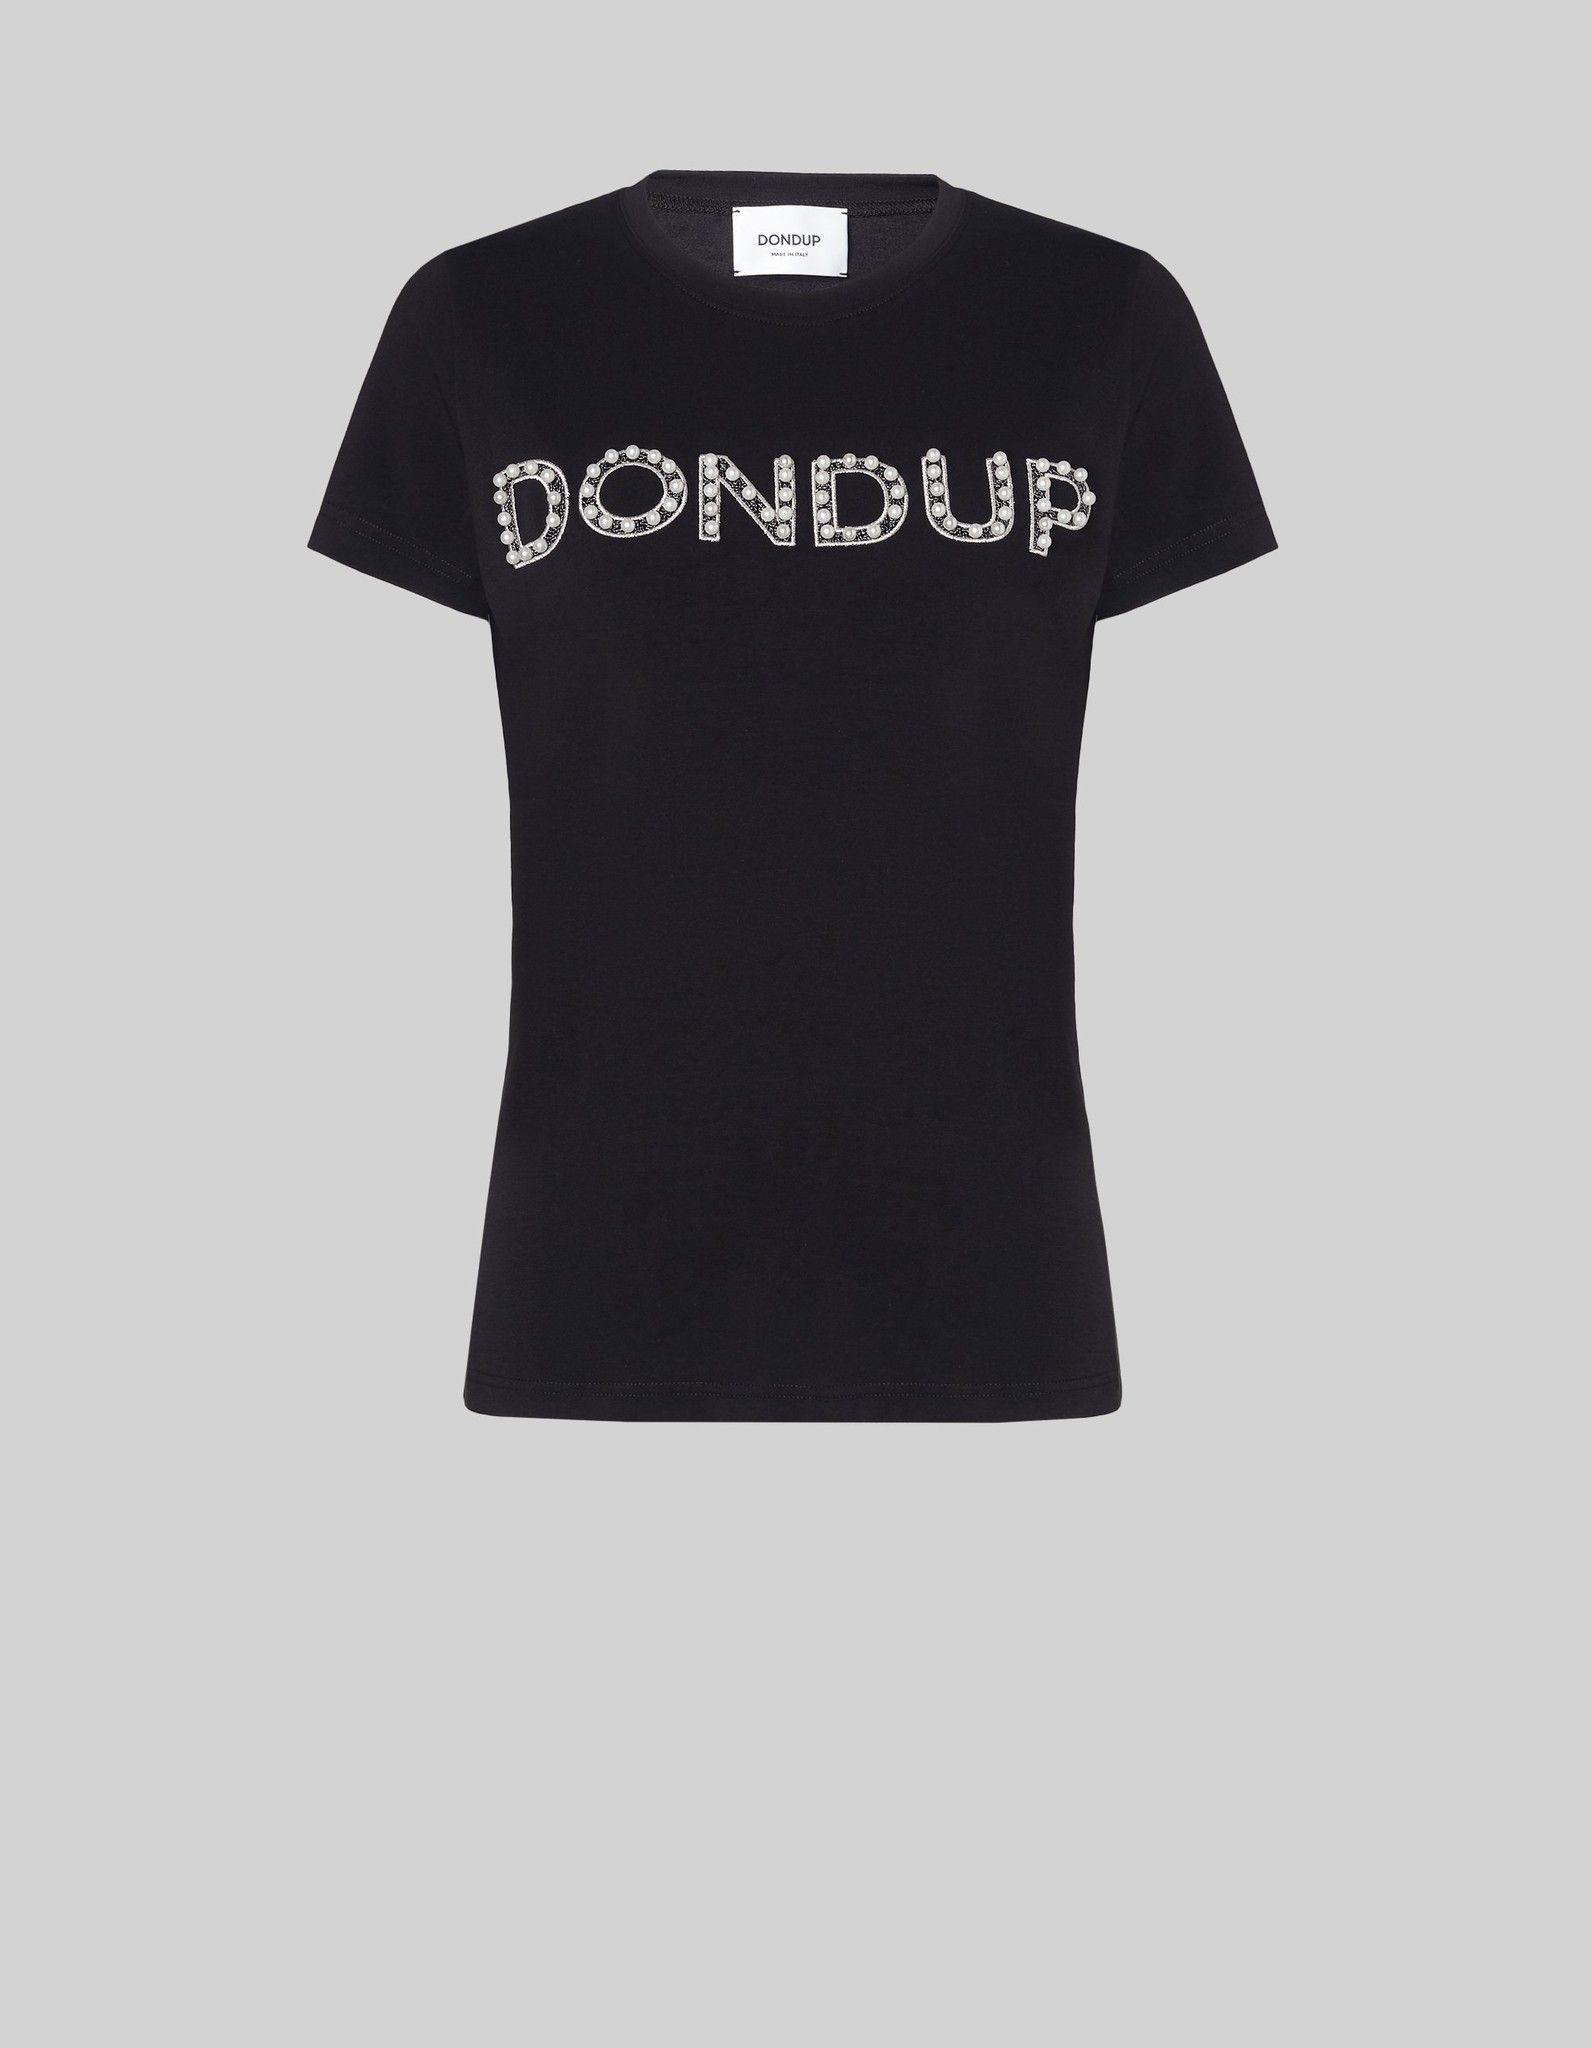 DONDUP T-SHIRT CON PERLE RICAMATE